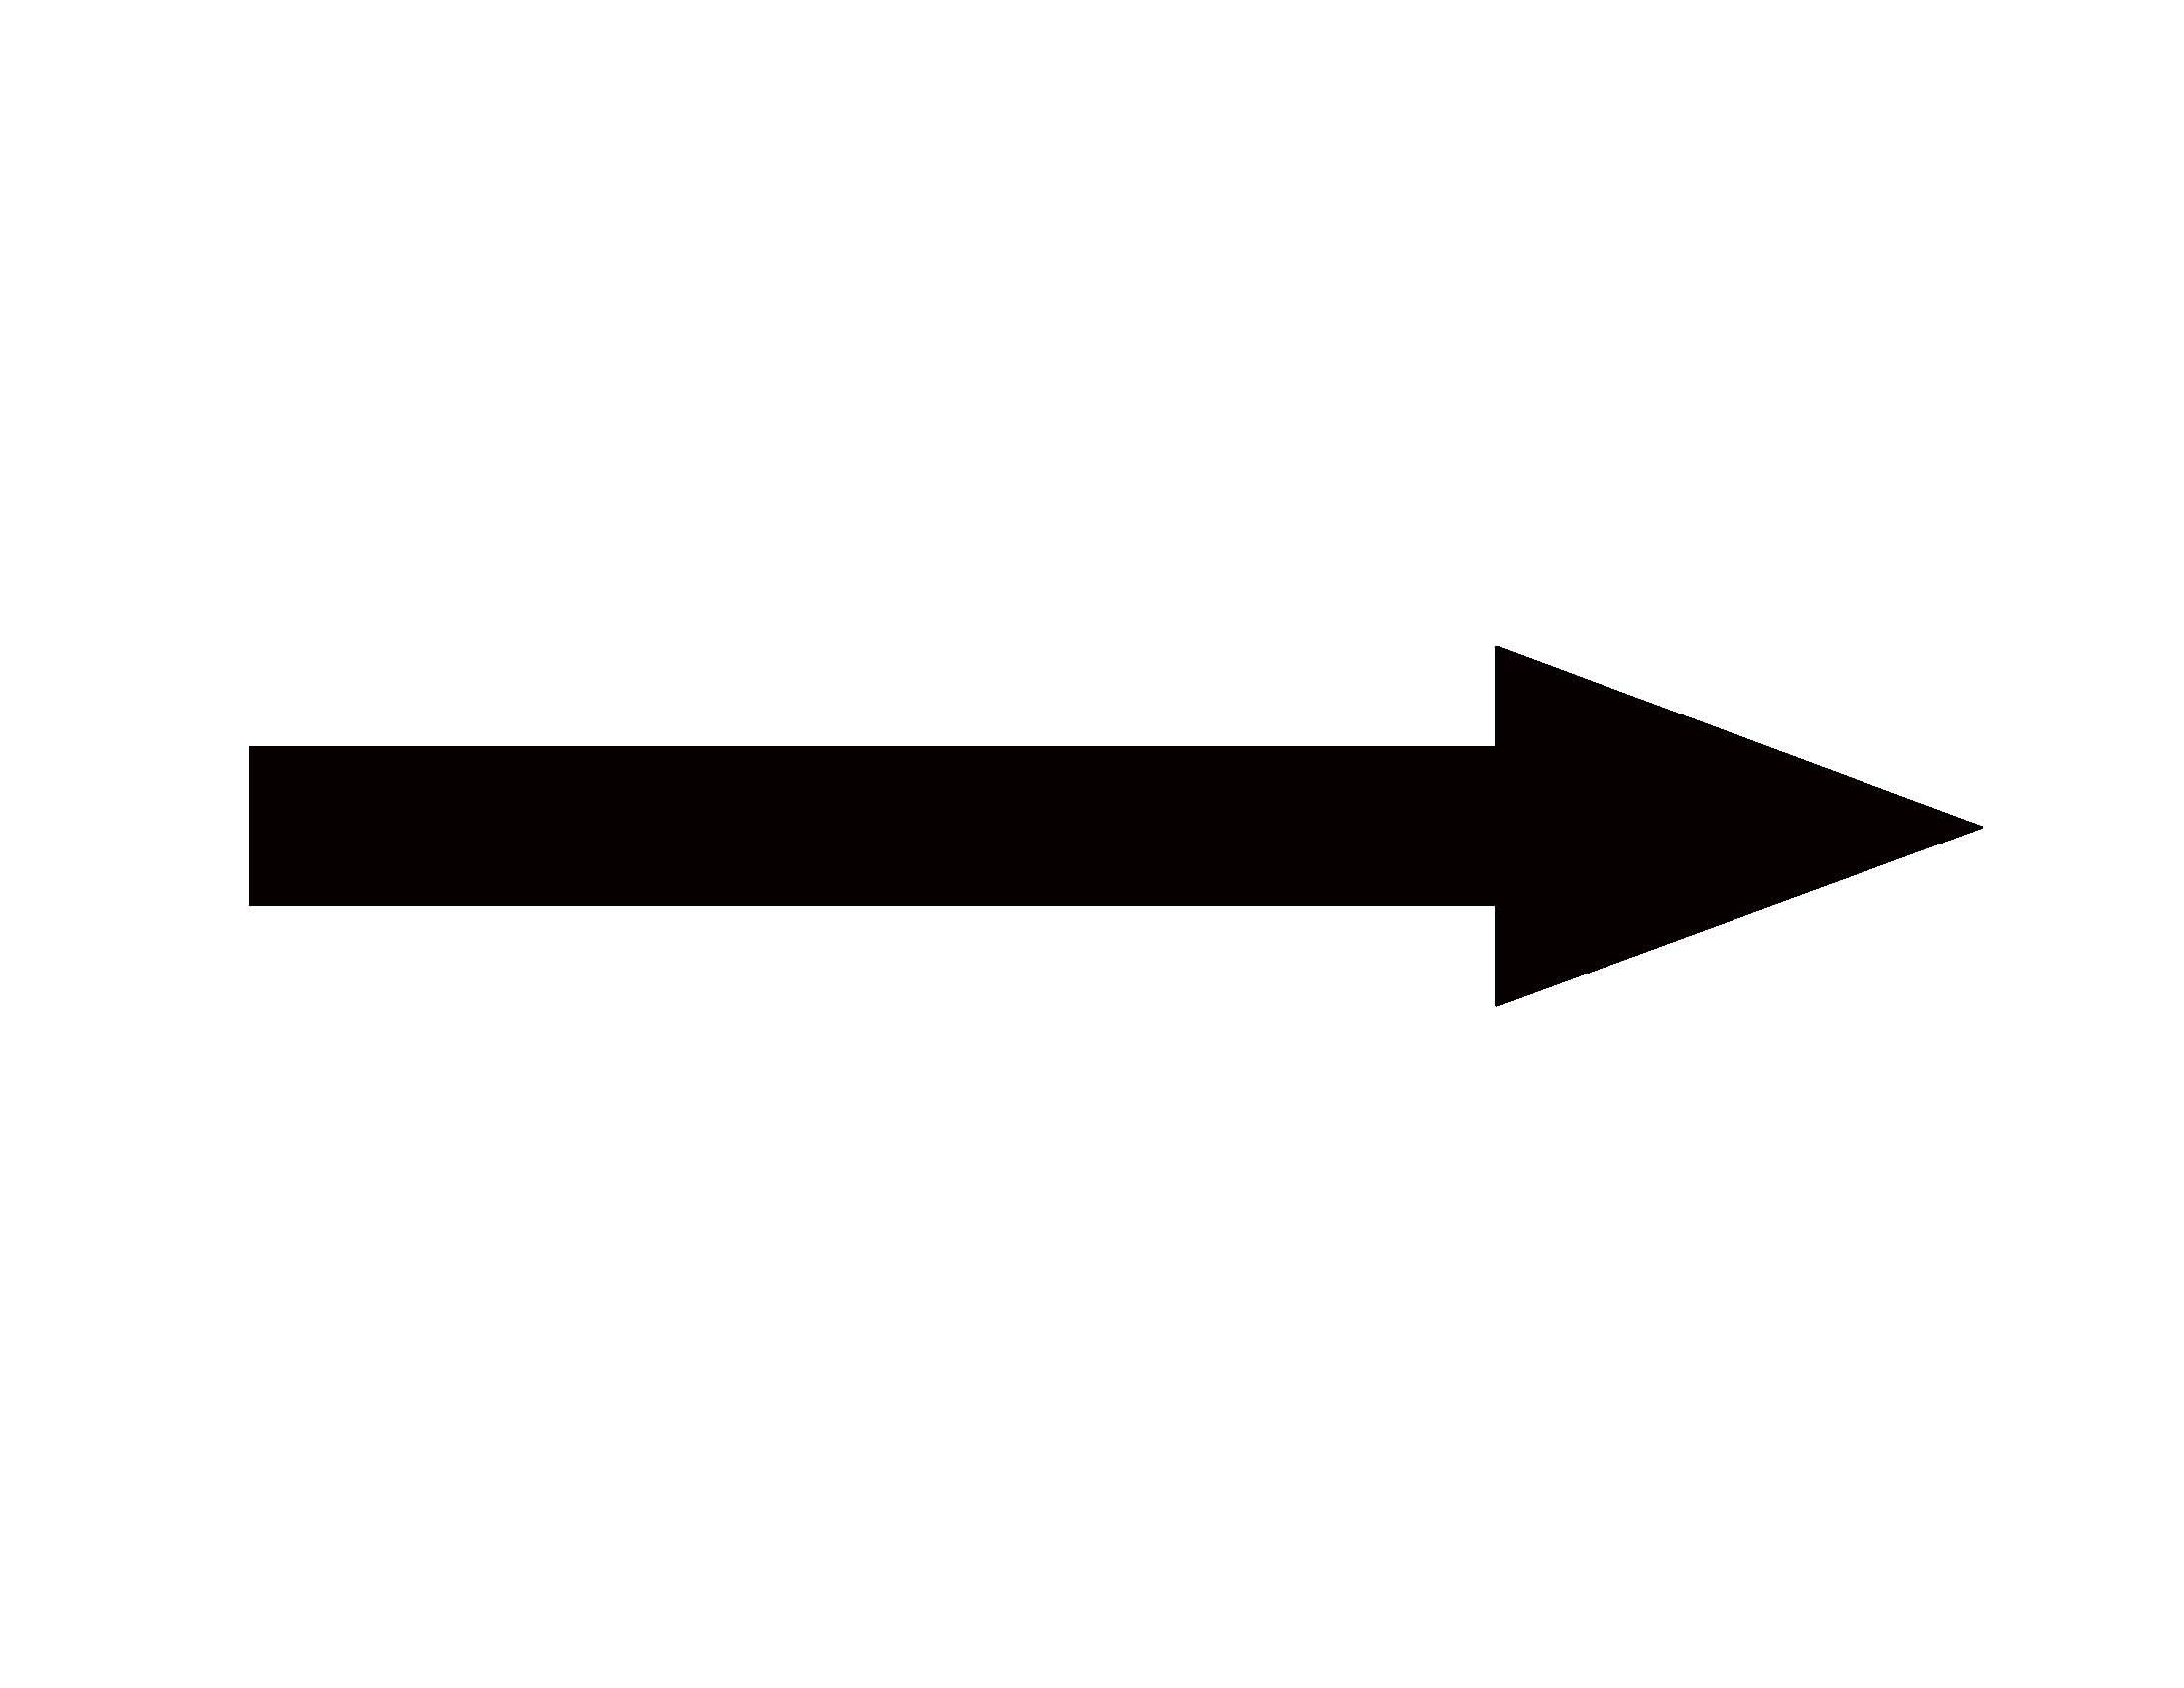 arrow clipart free silhouette